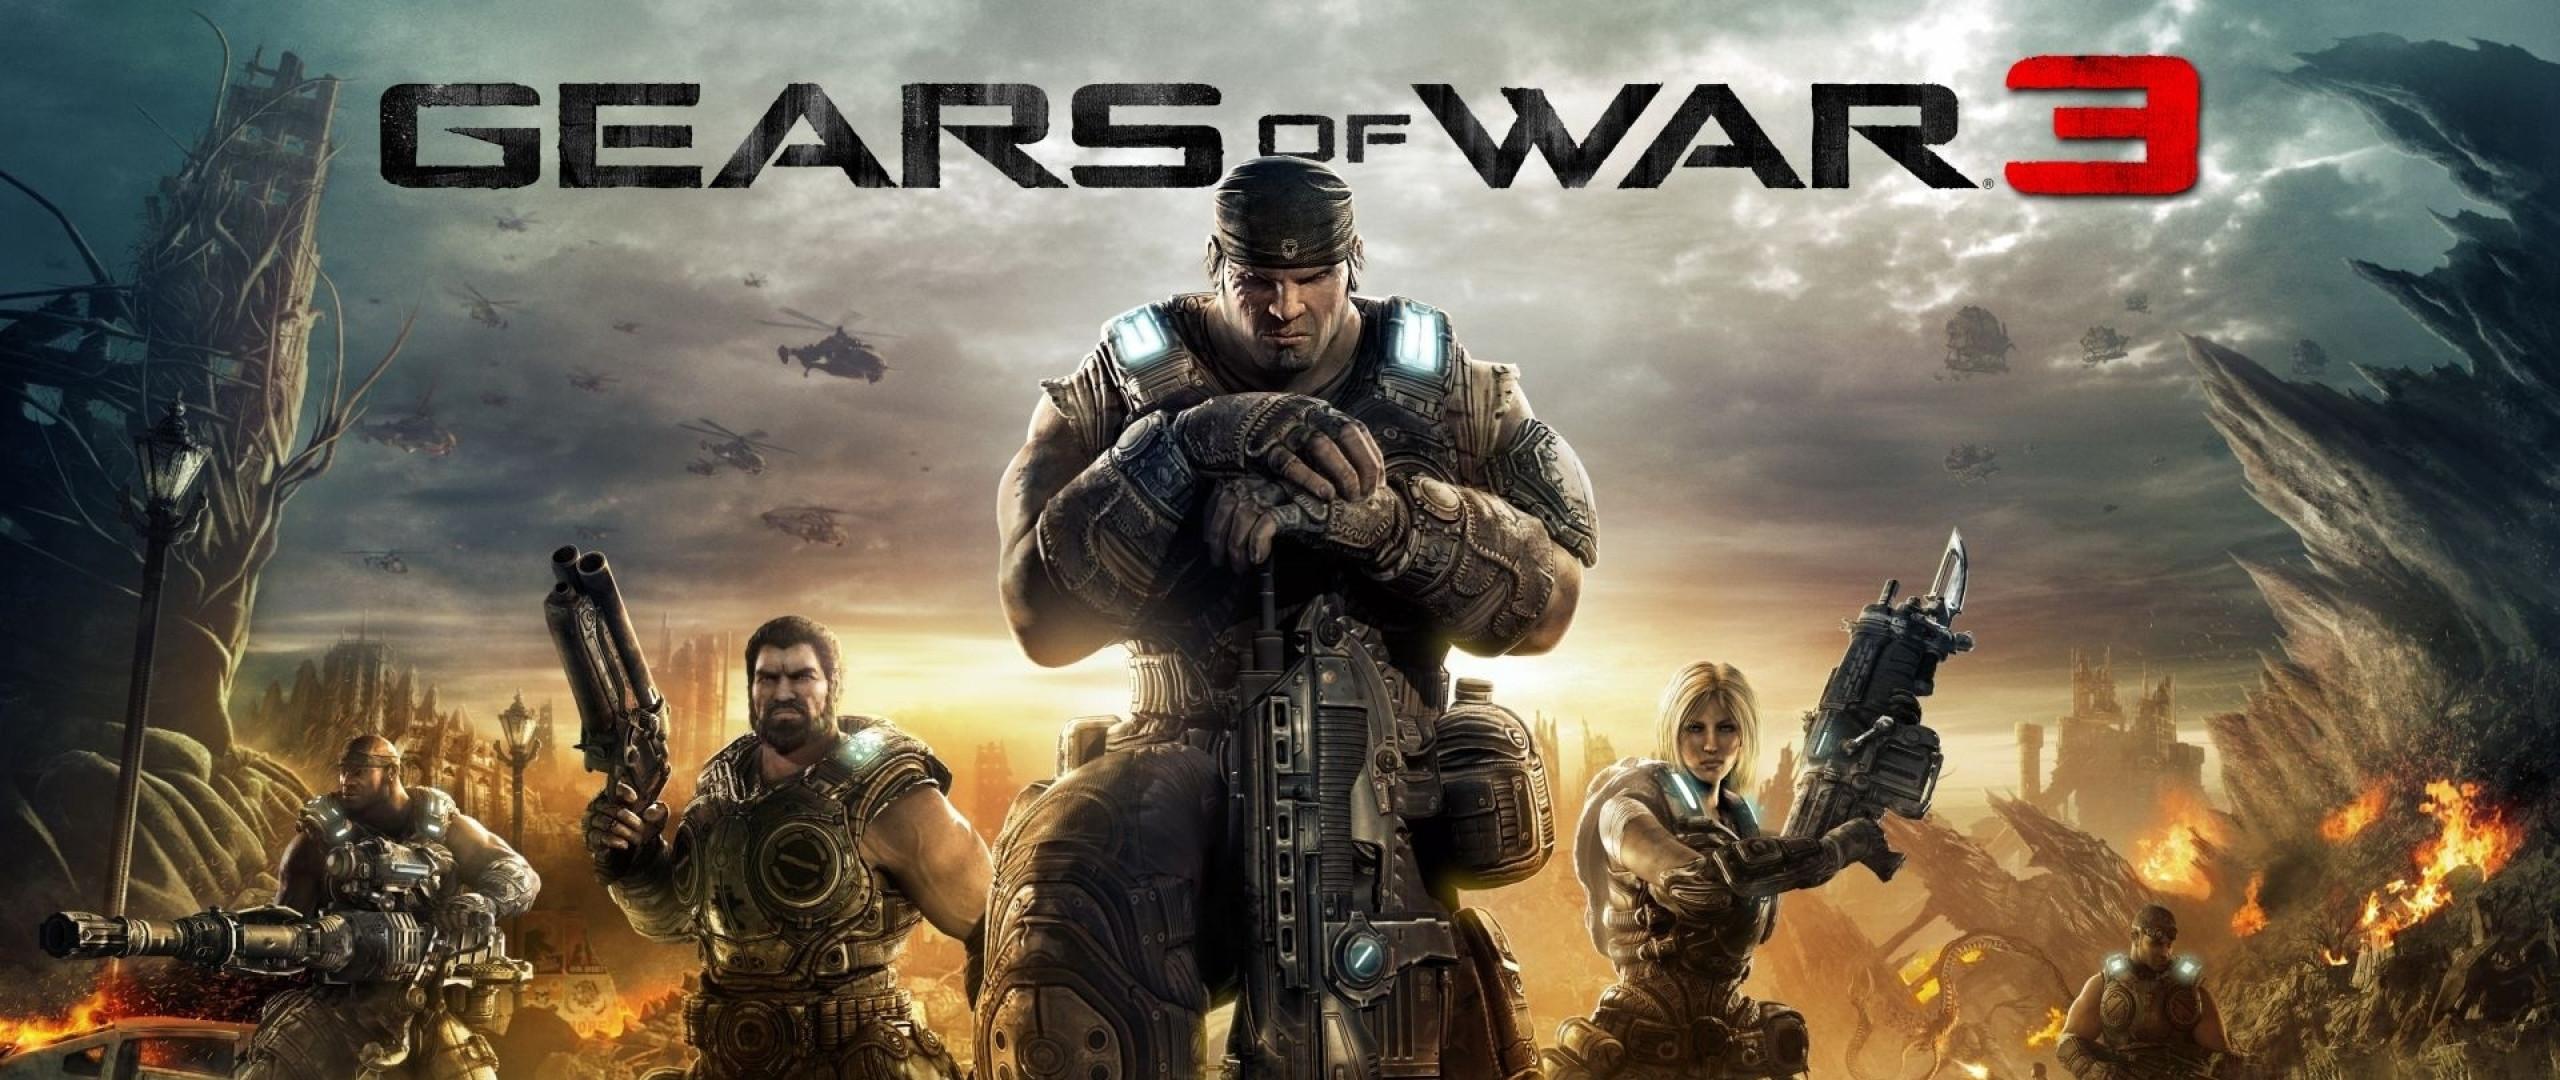 gears of war 3 wallpaper hd (84+ images)